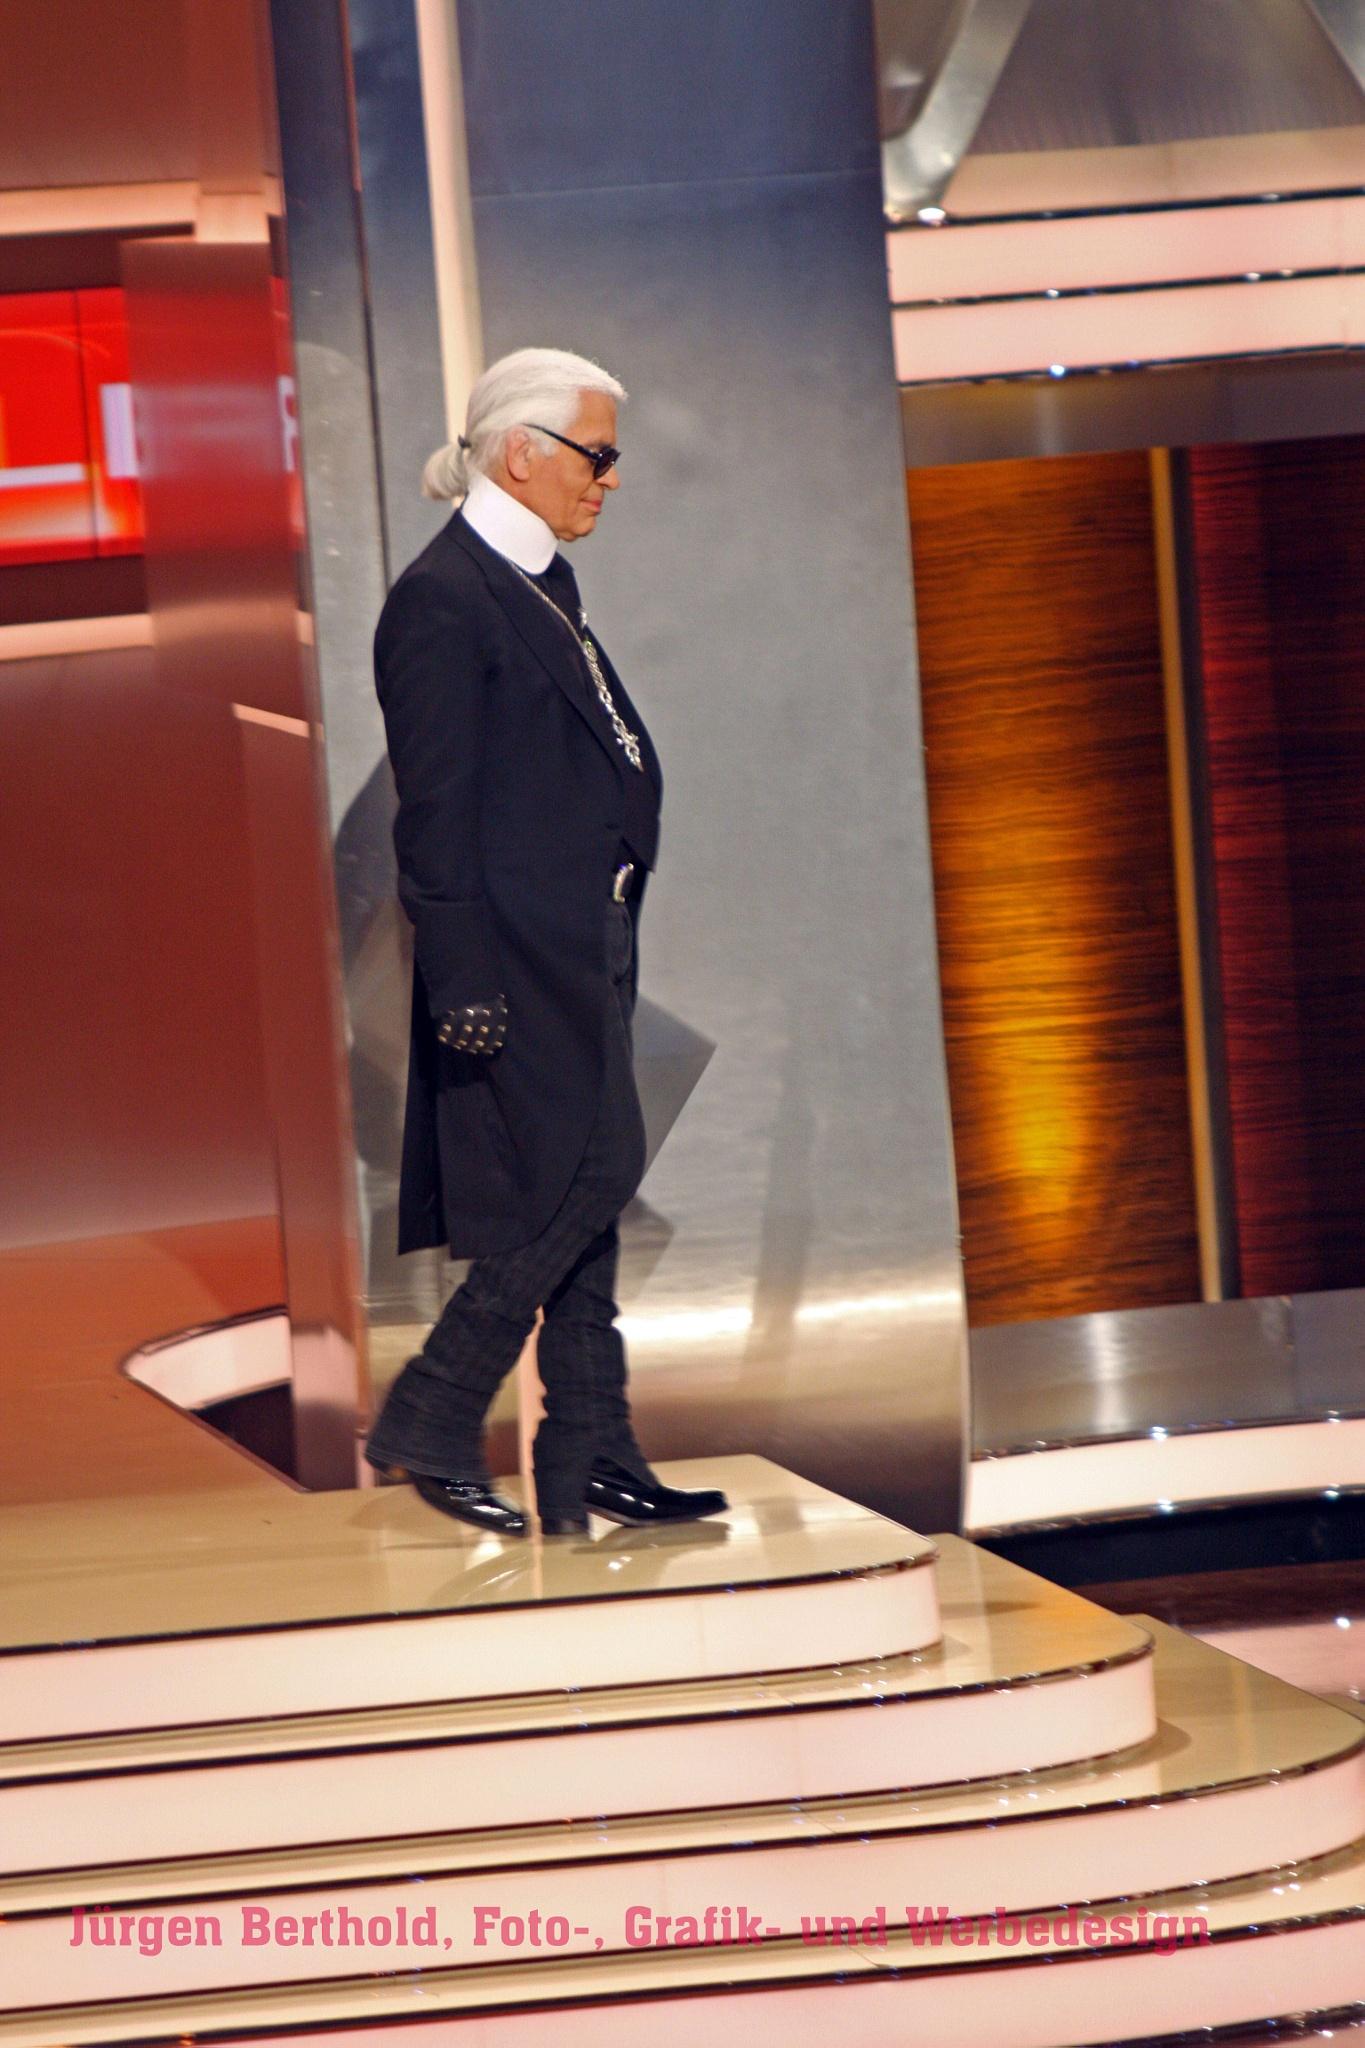 Karl Lagerfeld by Steelblue67